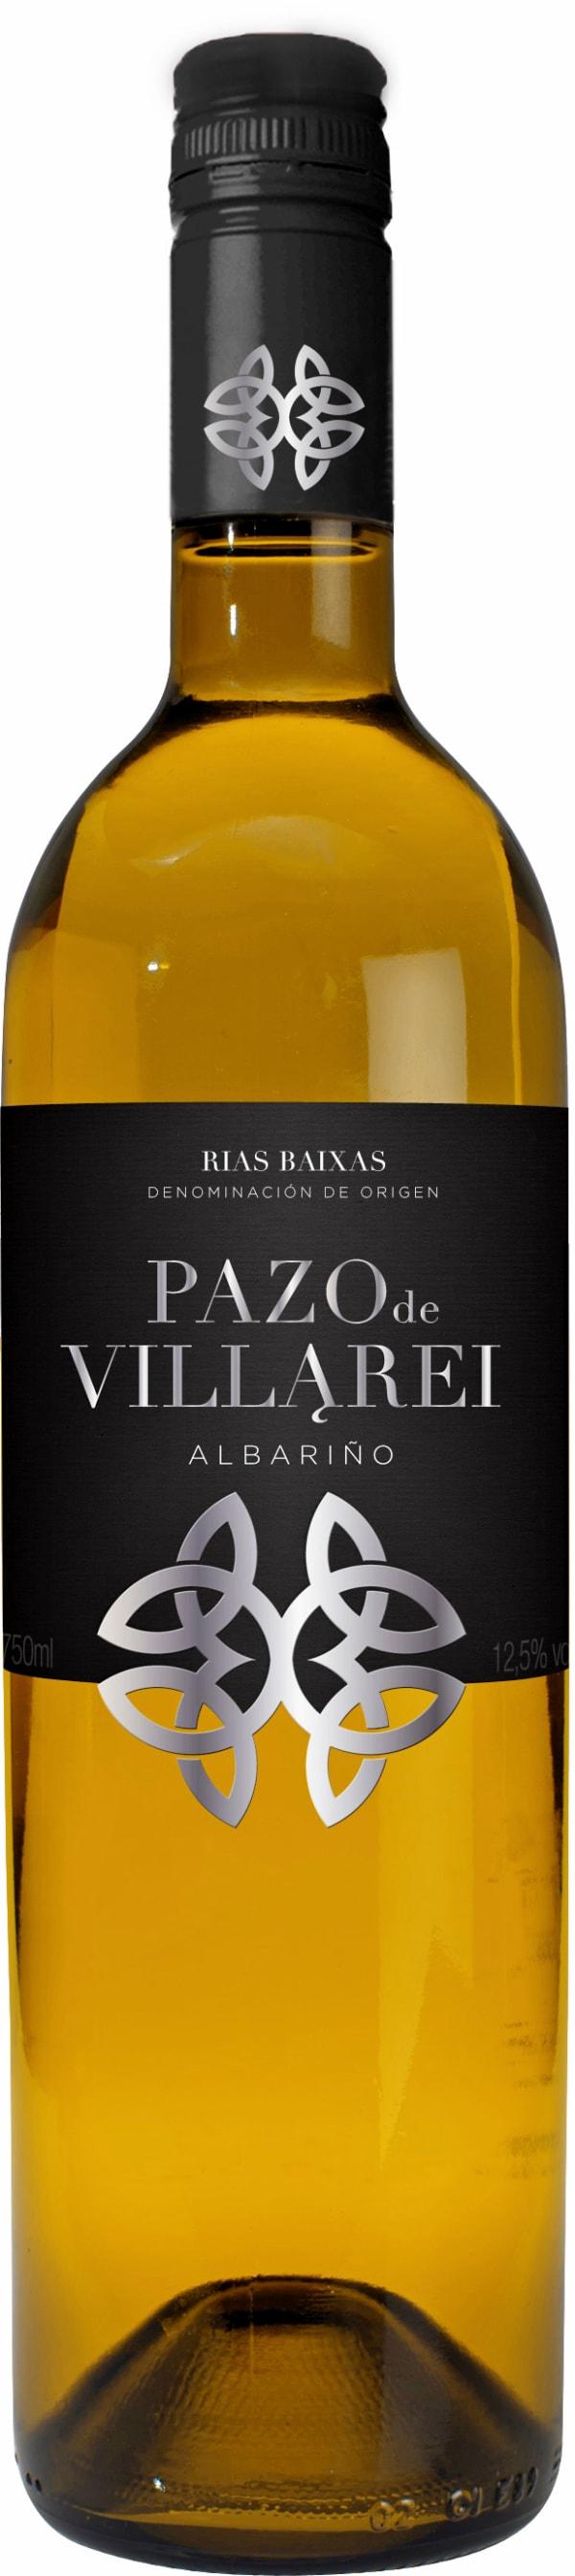 Pazo de Villarei Albariño 2016